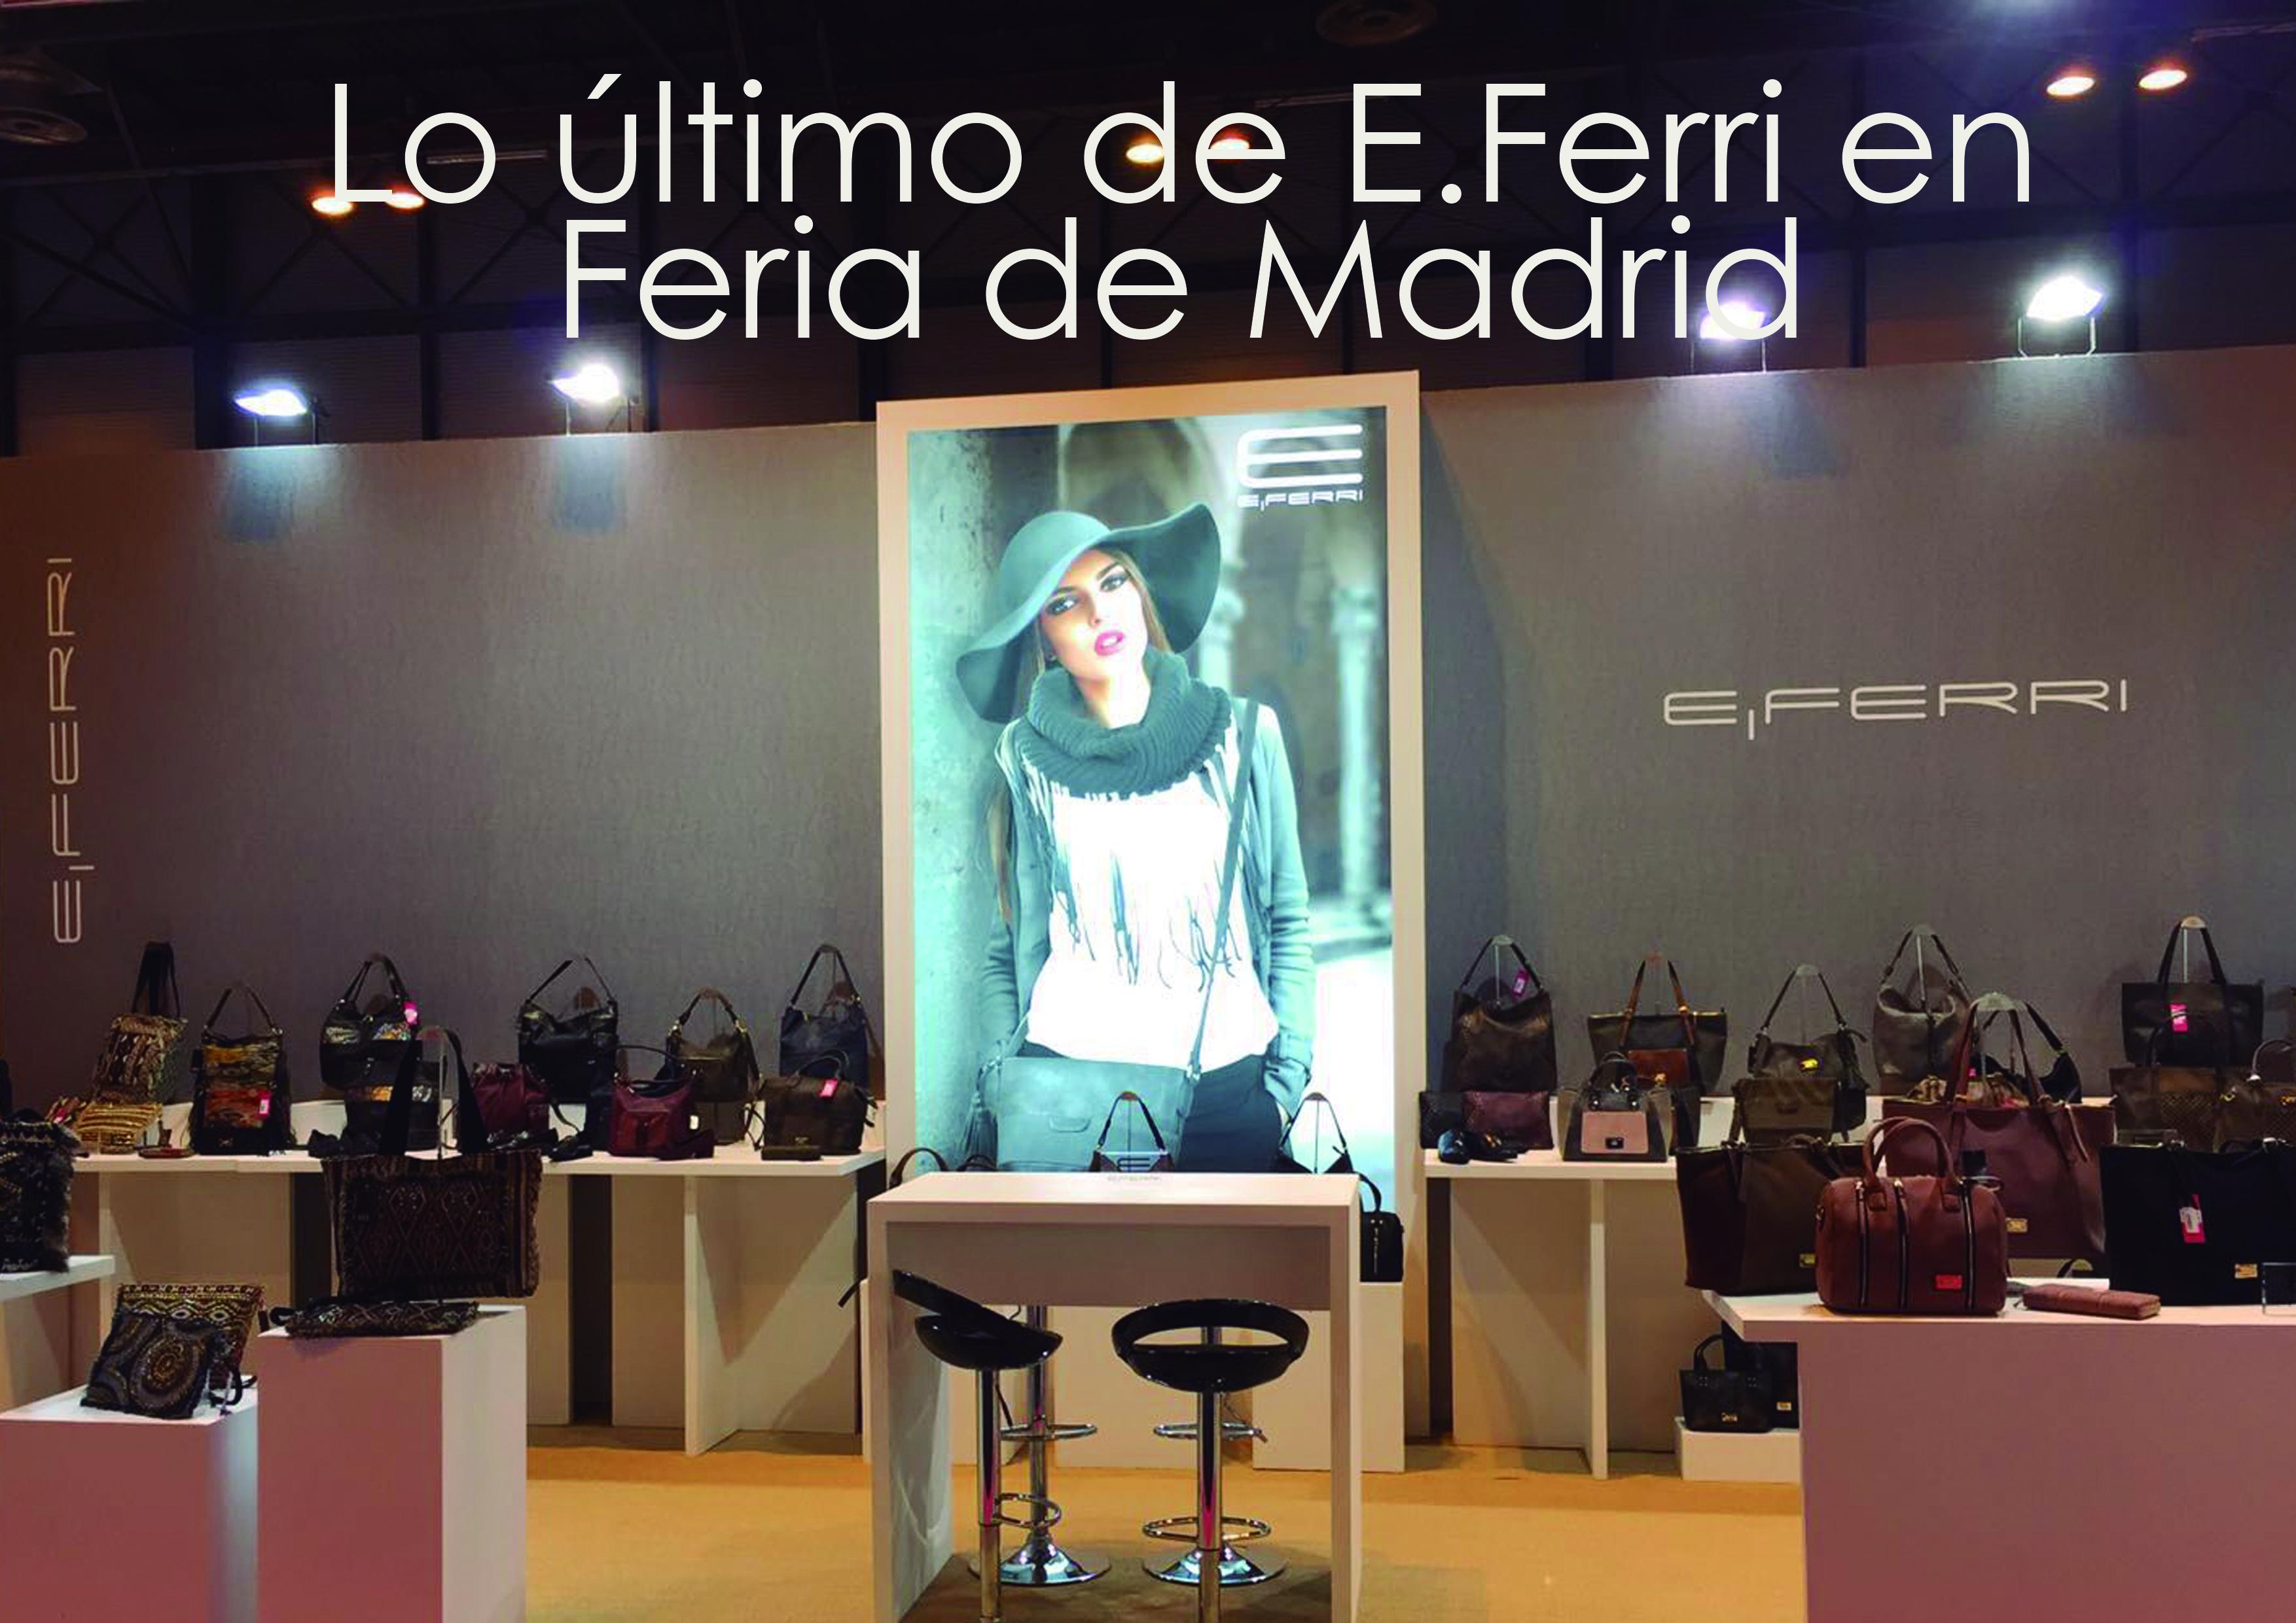 Lo último de E.Ferri en Feria de Madrid